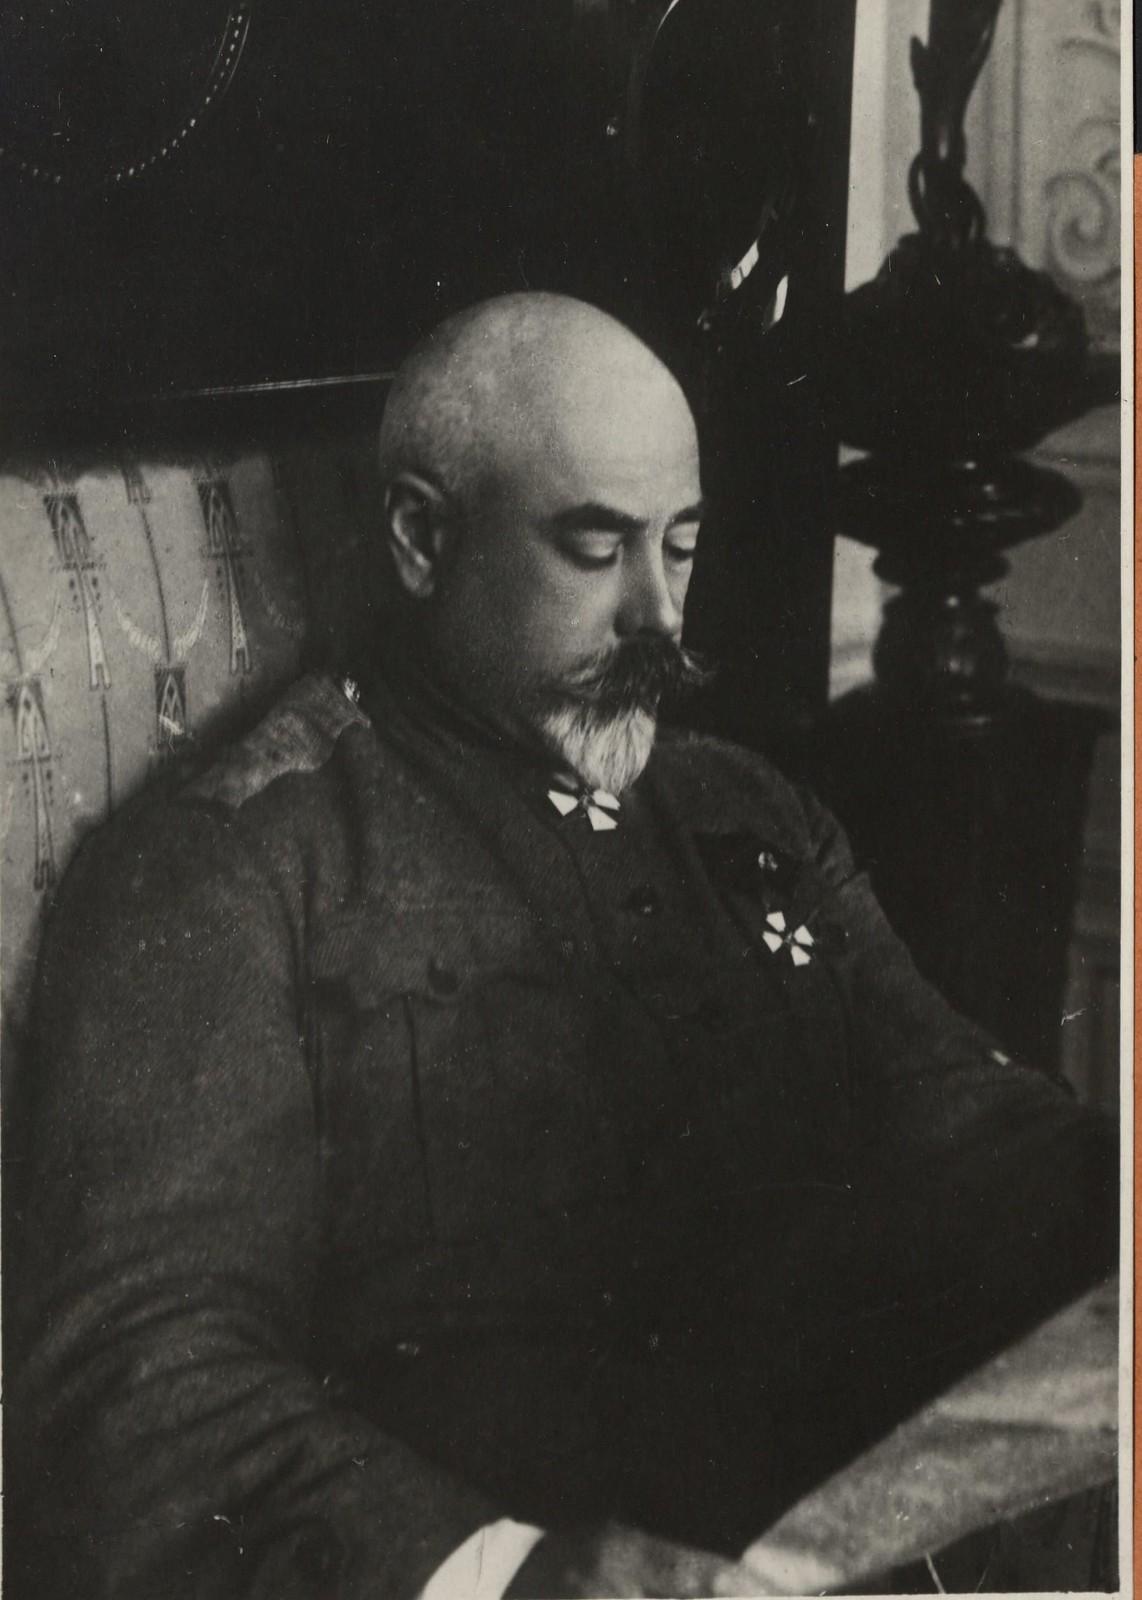 511. 1918. Генерал Деникин в Екатеринодаре